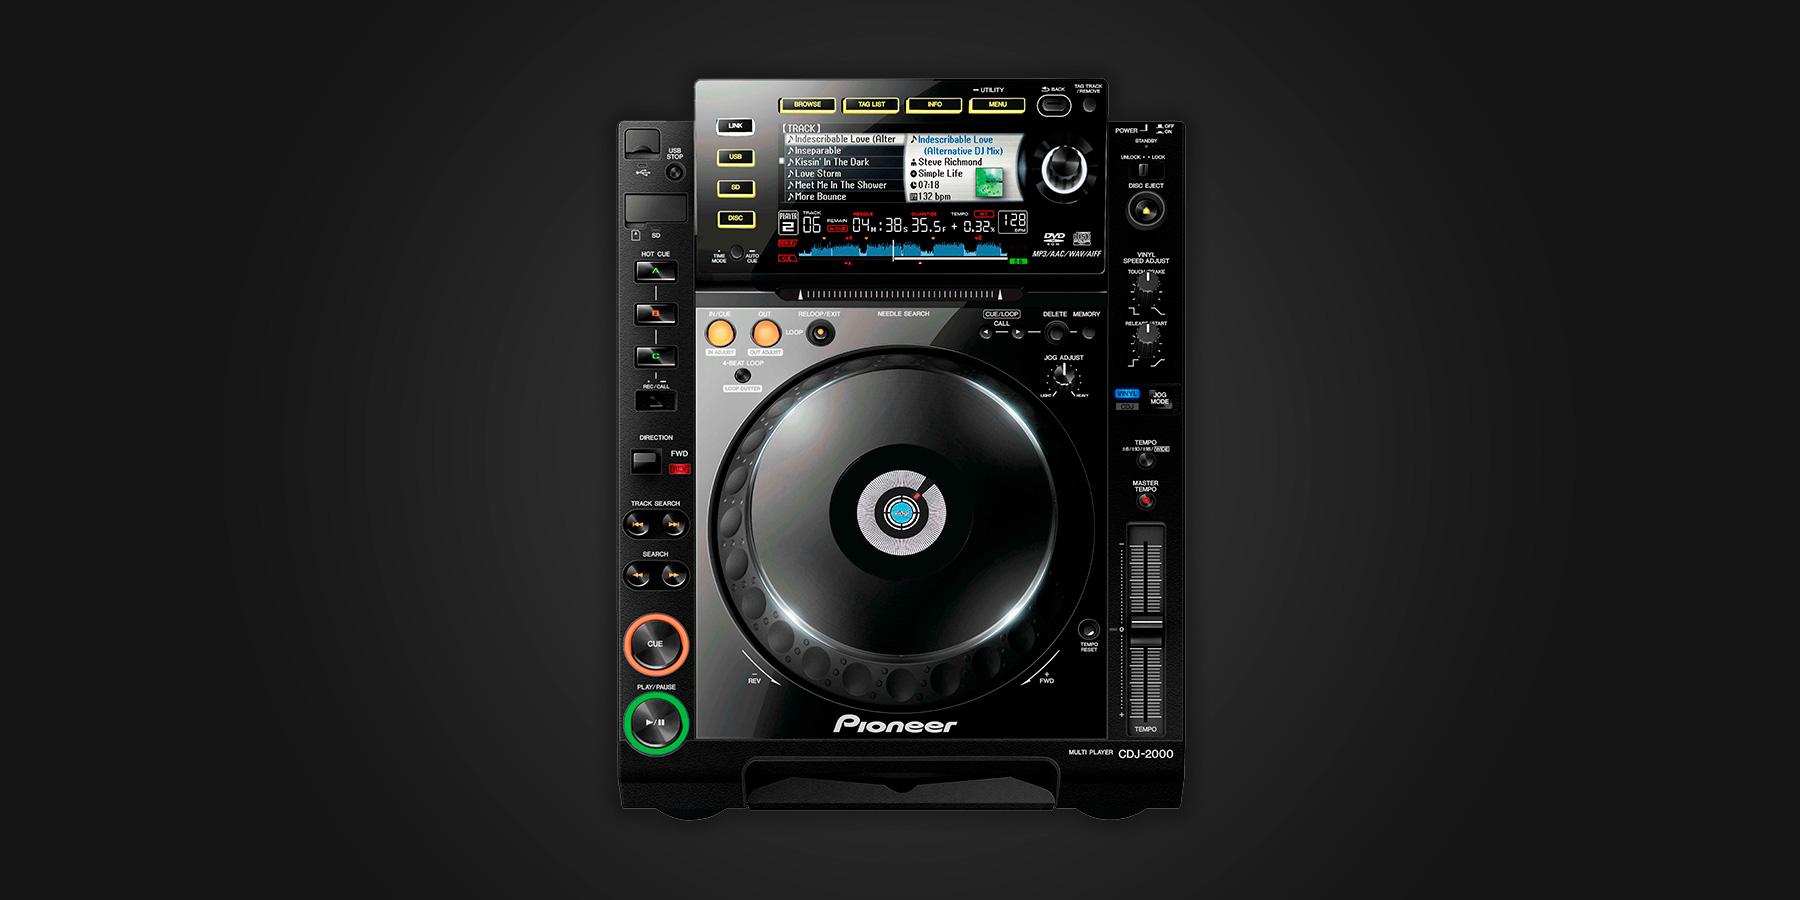 Pioneer DJ CDJ-2000 - Serato DJ Hardware